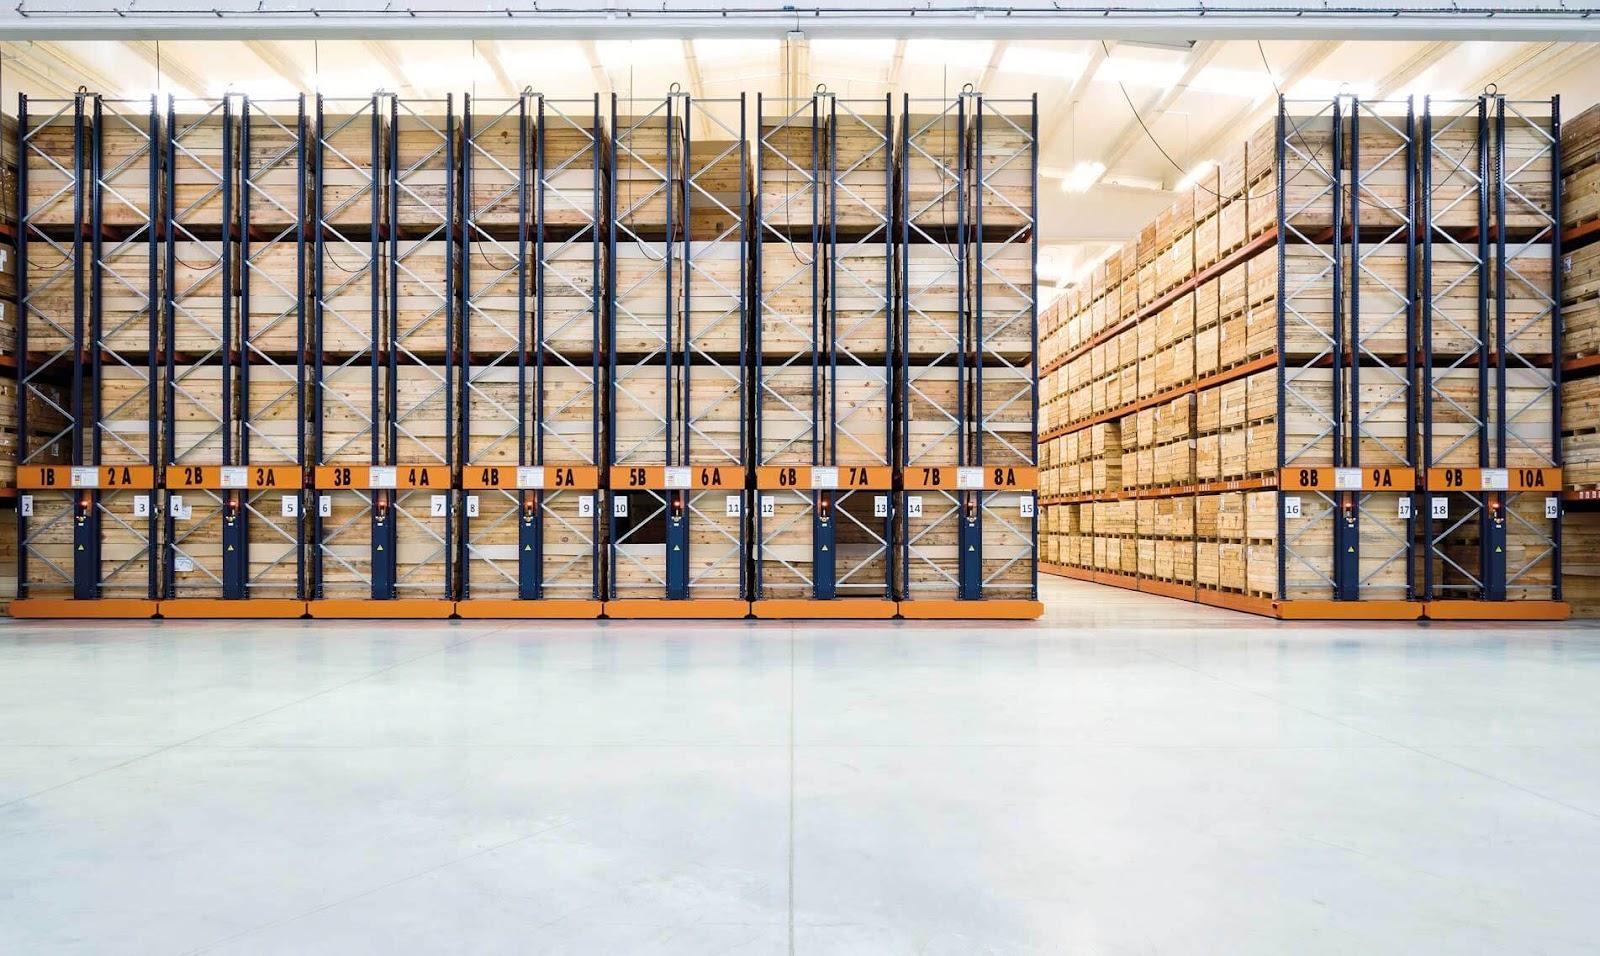 estanterias-moviles-para-almacenes